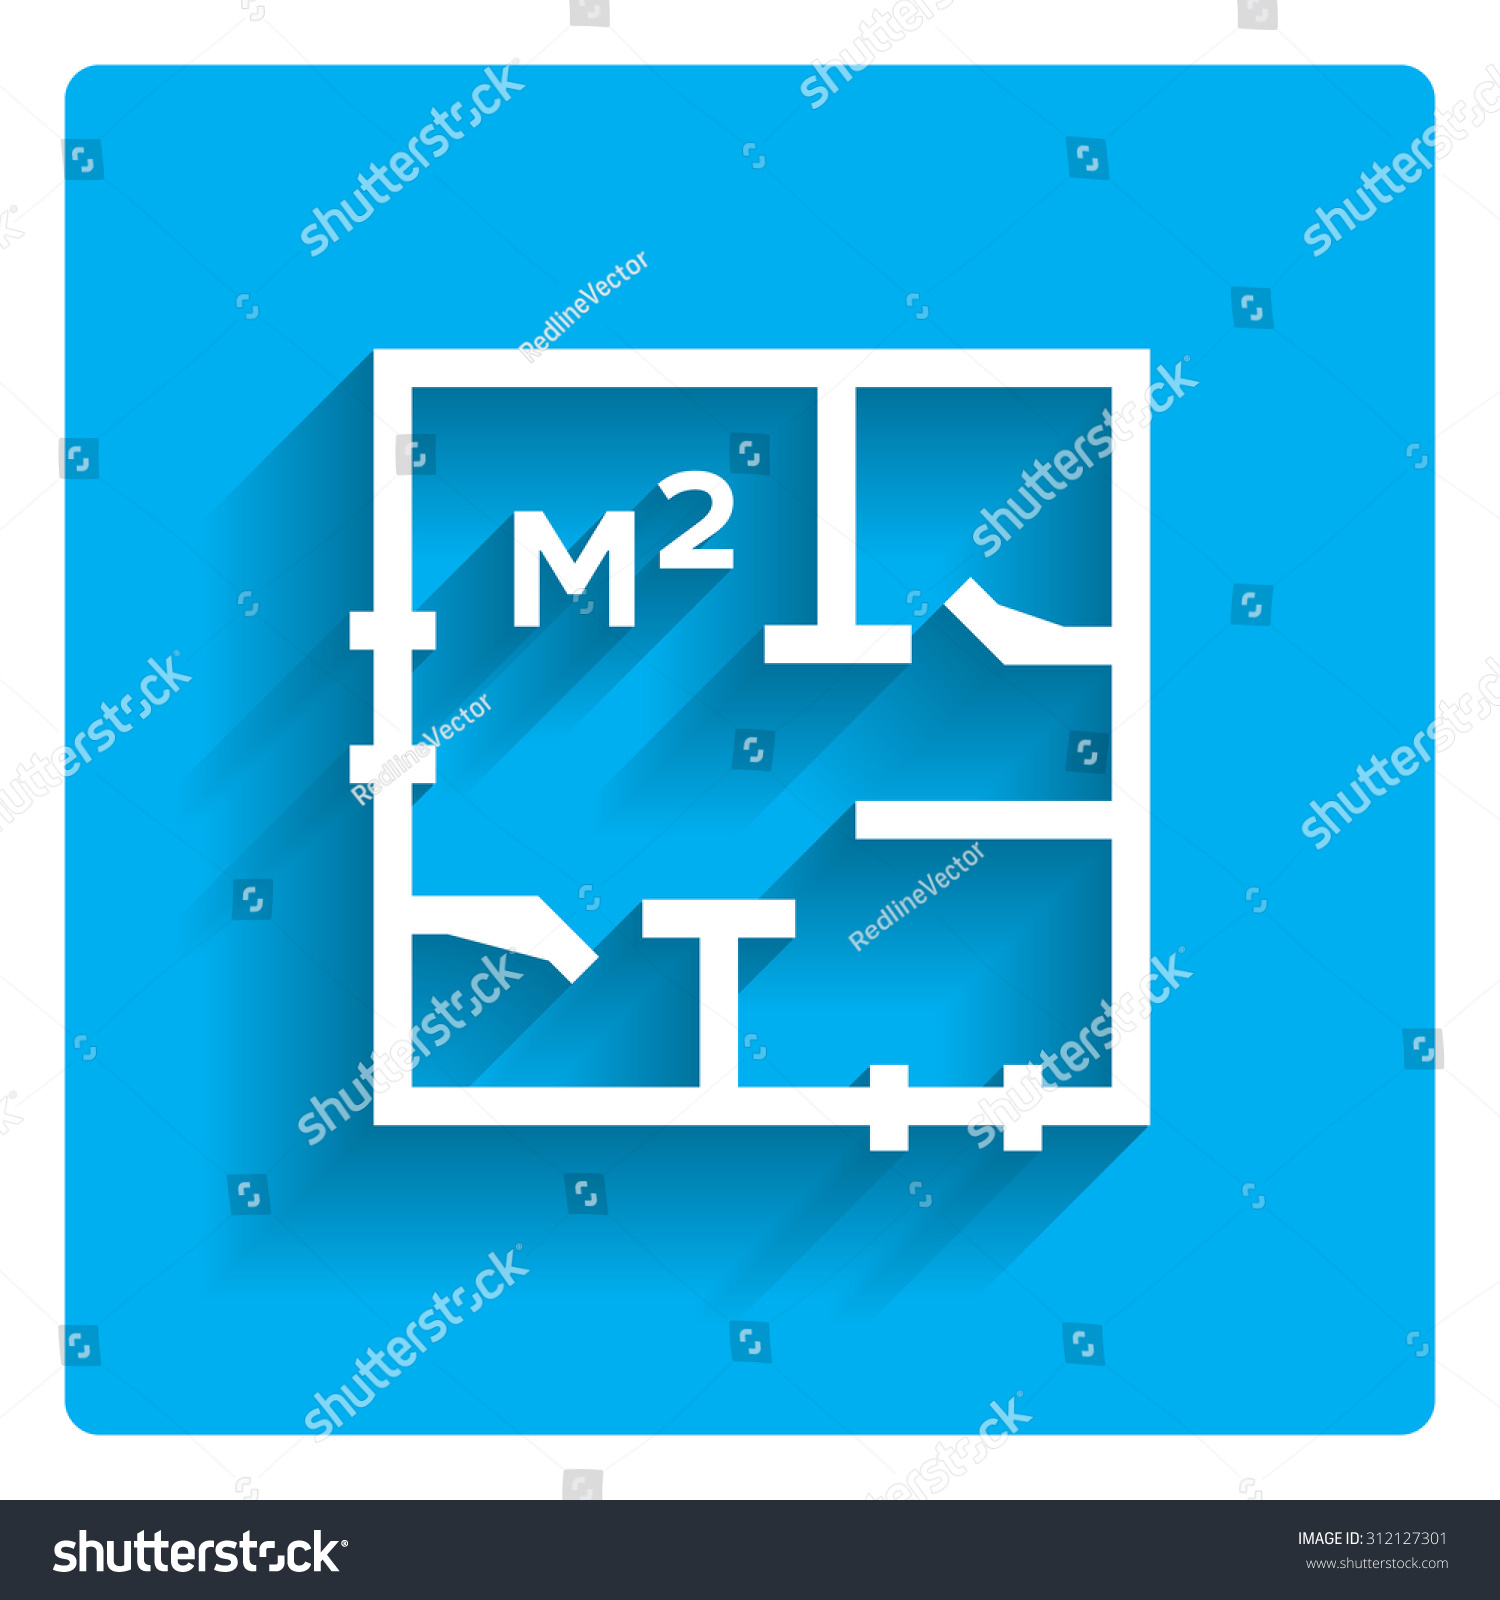 Icon Apartment Scheme Square Meter Designation Stock Vector (Royalty ...